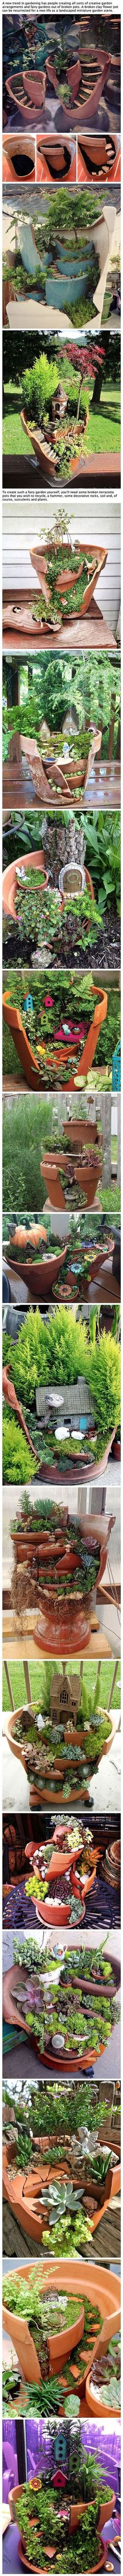 Broken Pots Turned Into Beautiful Fairy Gardens.: